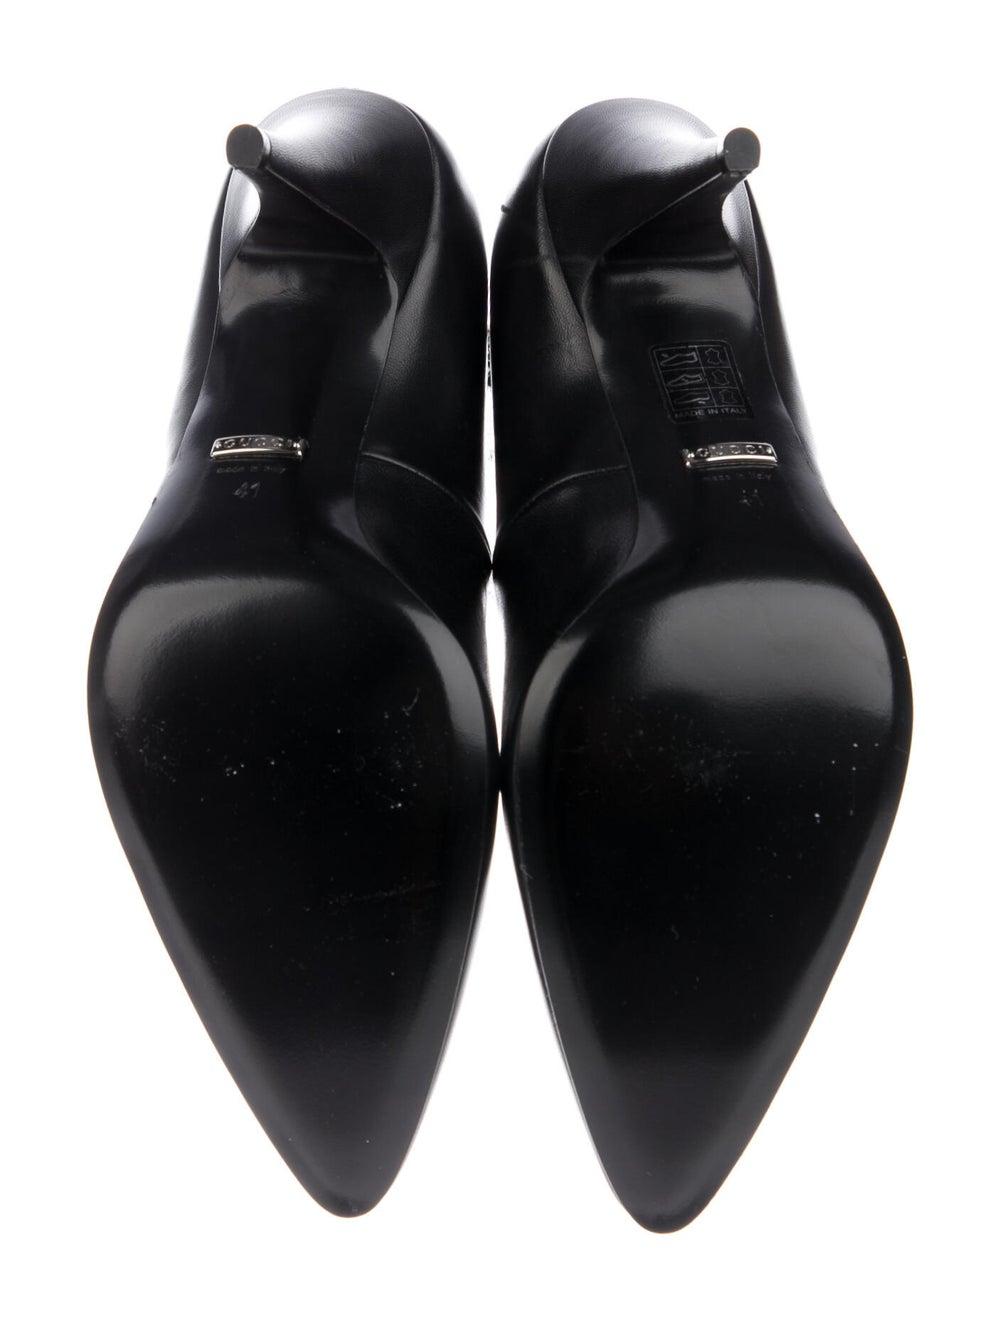 Gucci Leather Crystal Embellishments Pumps Black - image 5